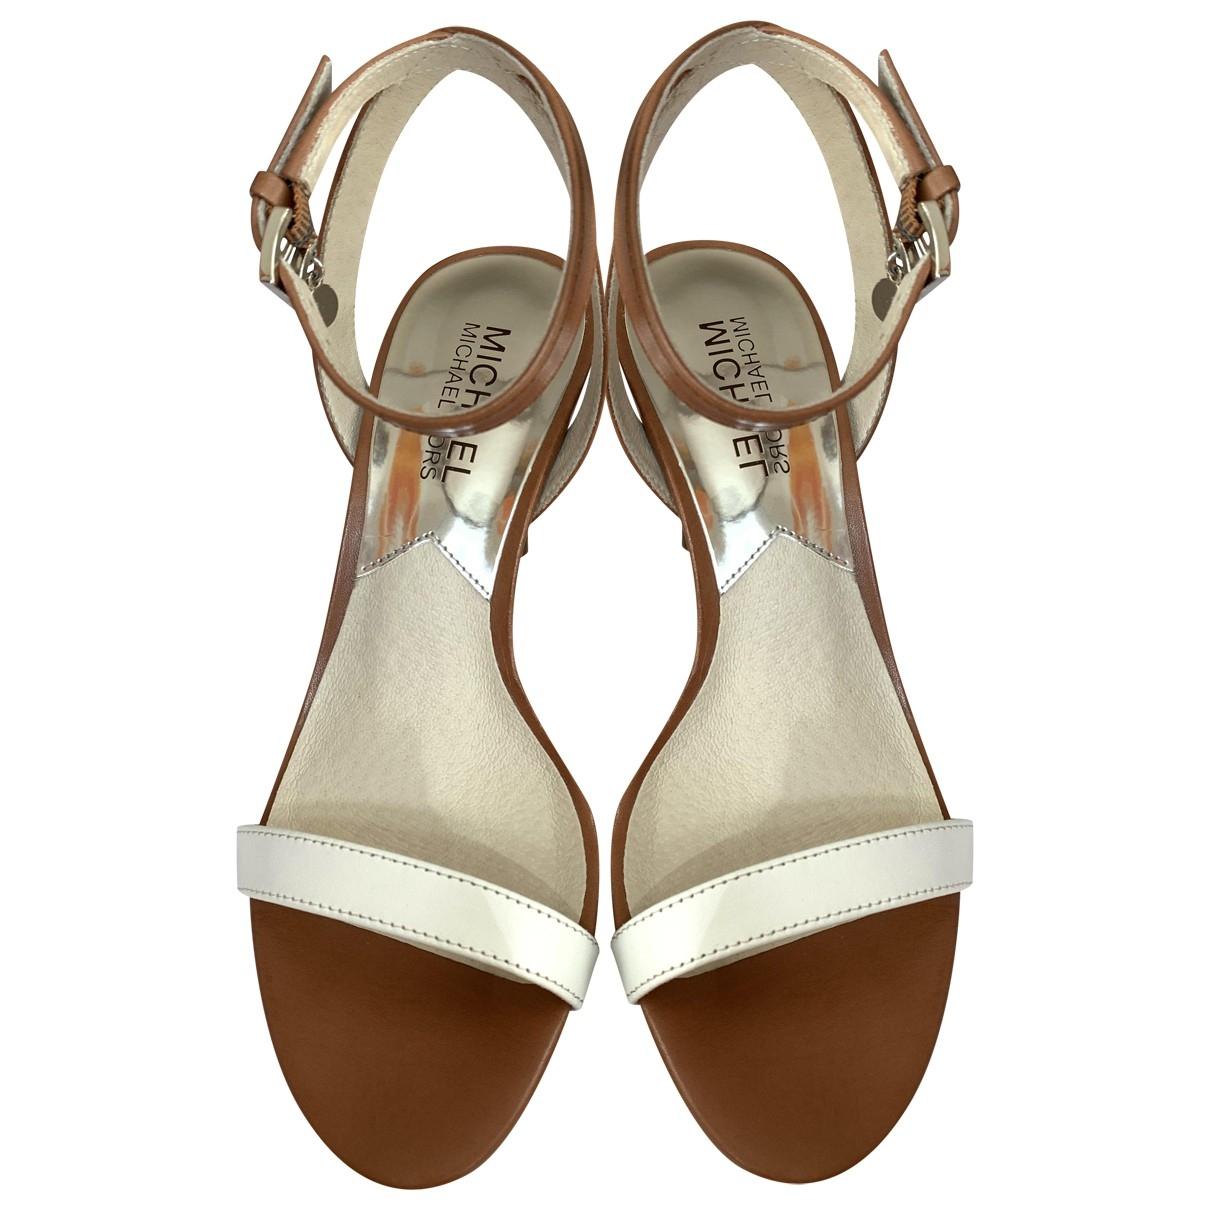 Michael Kors \N Brown Leather Sandals for Women 35.5 EU